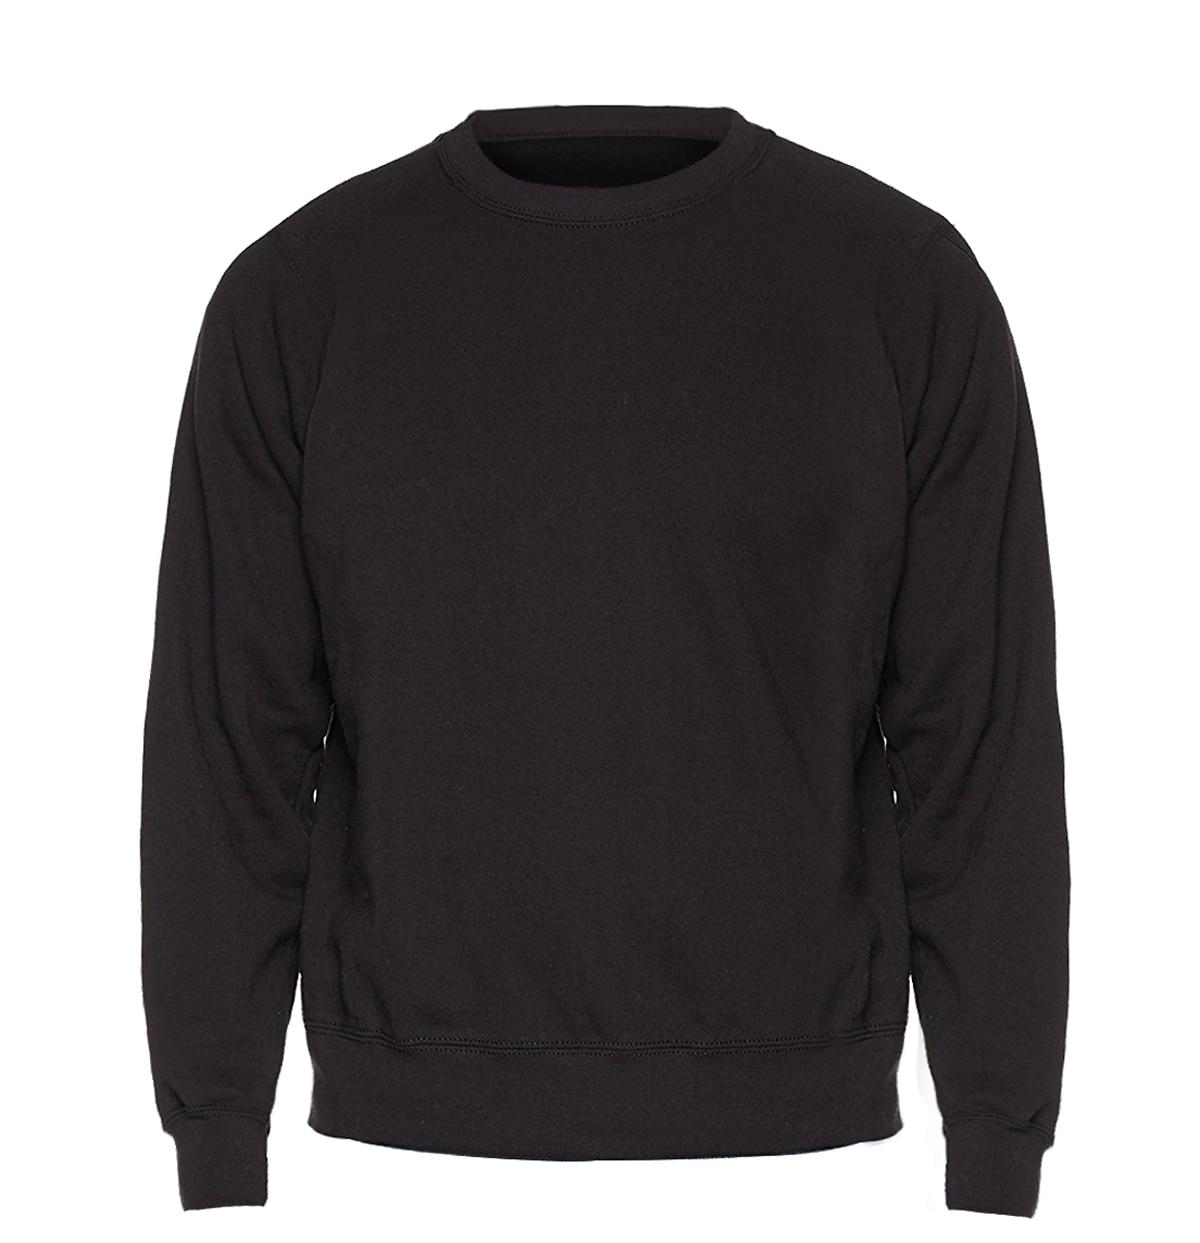 Solid color Sweatshirt Men Hoodie Crewneck Sweatshirts Winter Autumn Fleece Hoody Casual Gray Blue Red Black White Streetwear 2